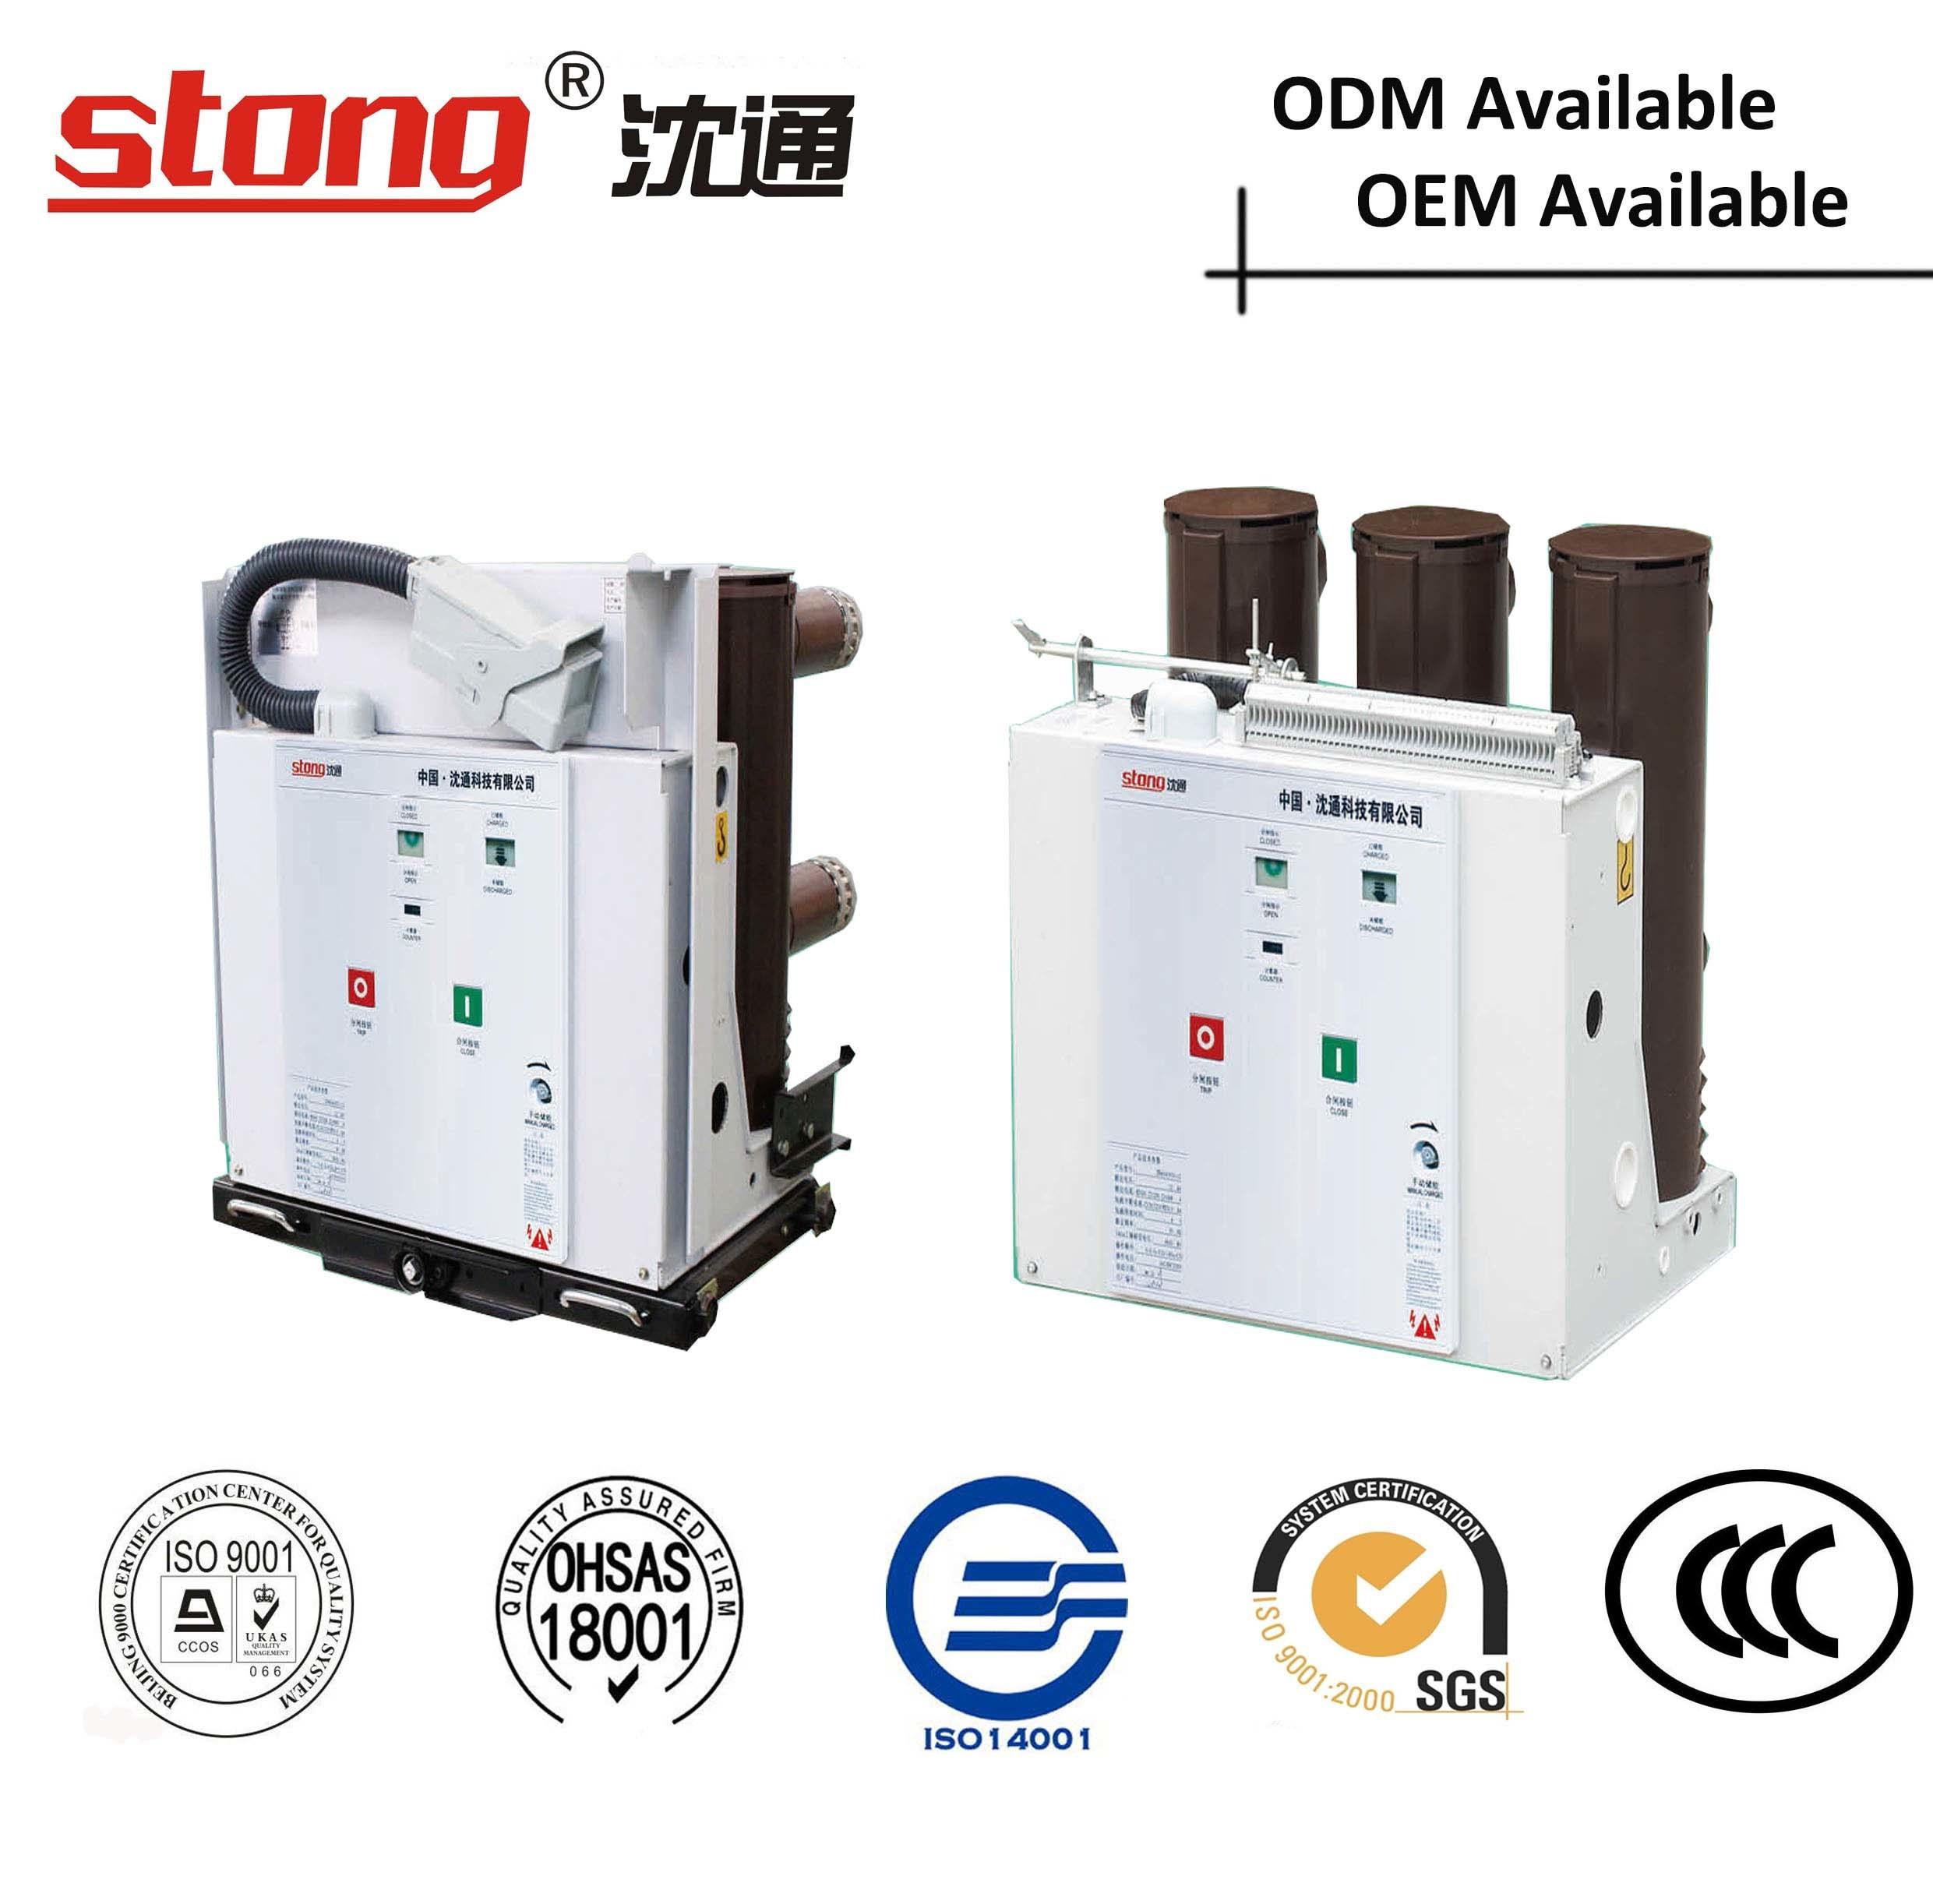 Stong Vs1 12kv Indoor Vcb Vacuum Circuit Breaker